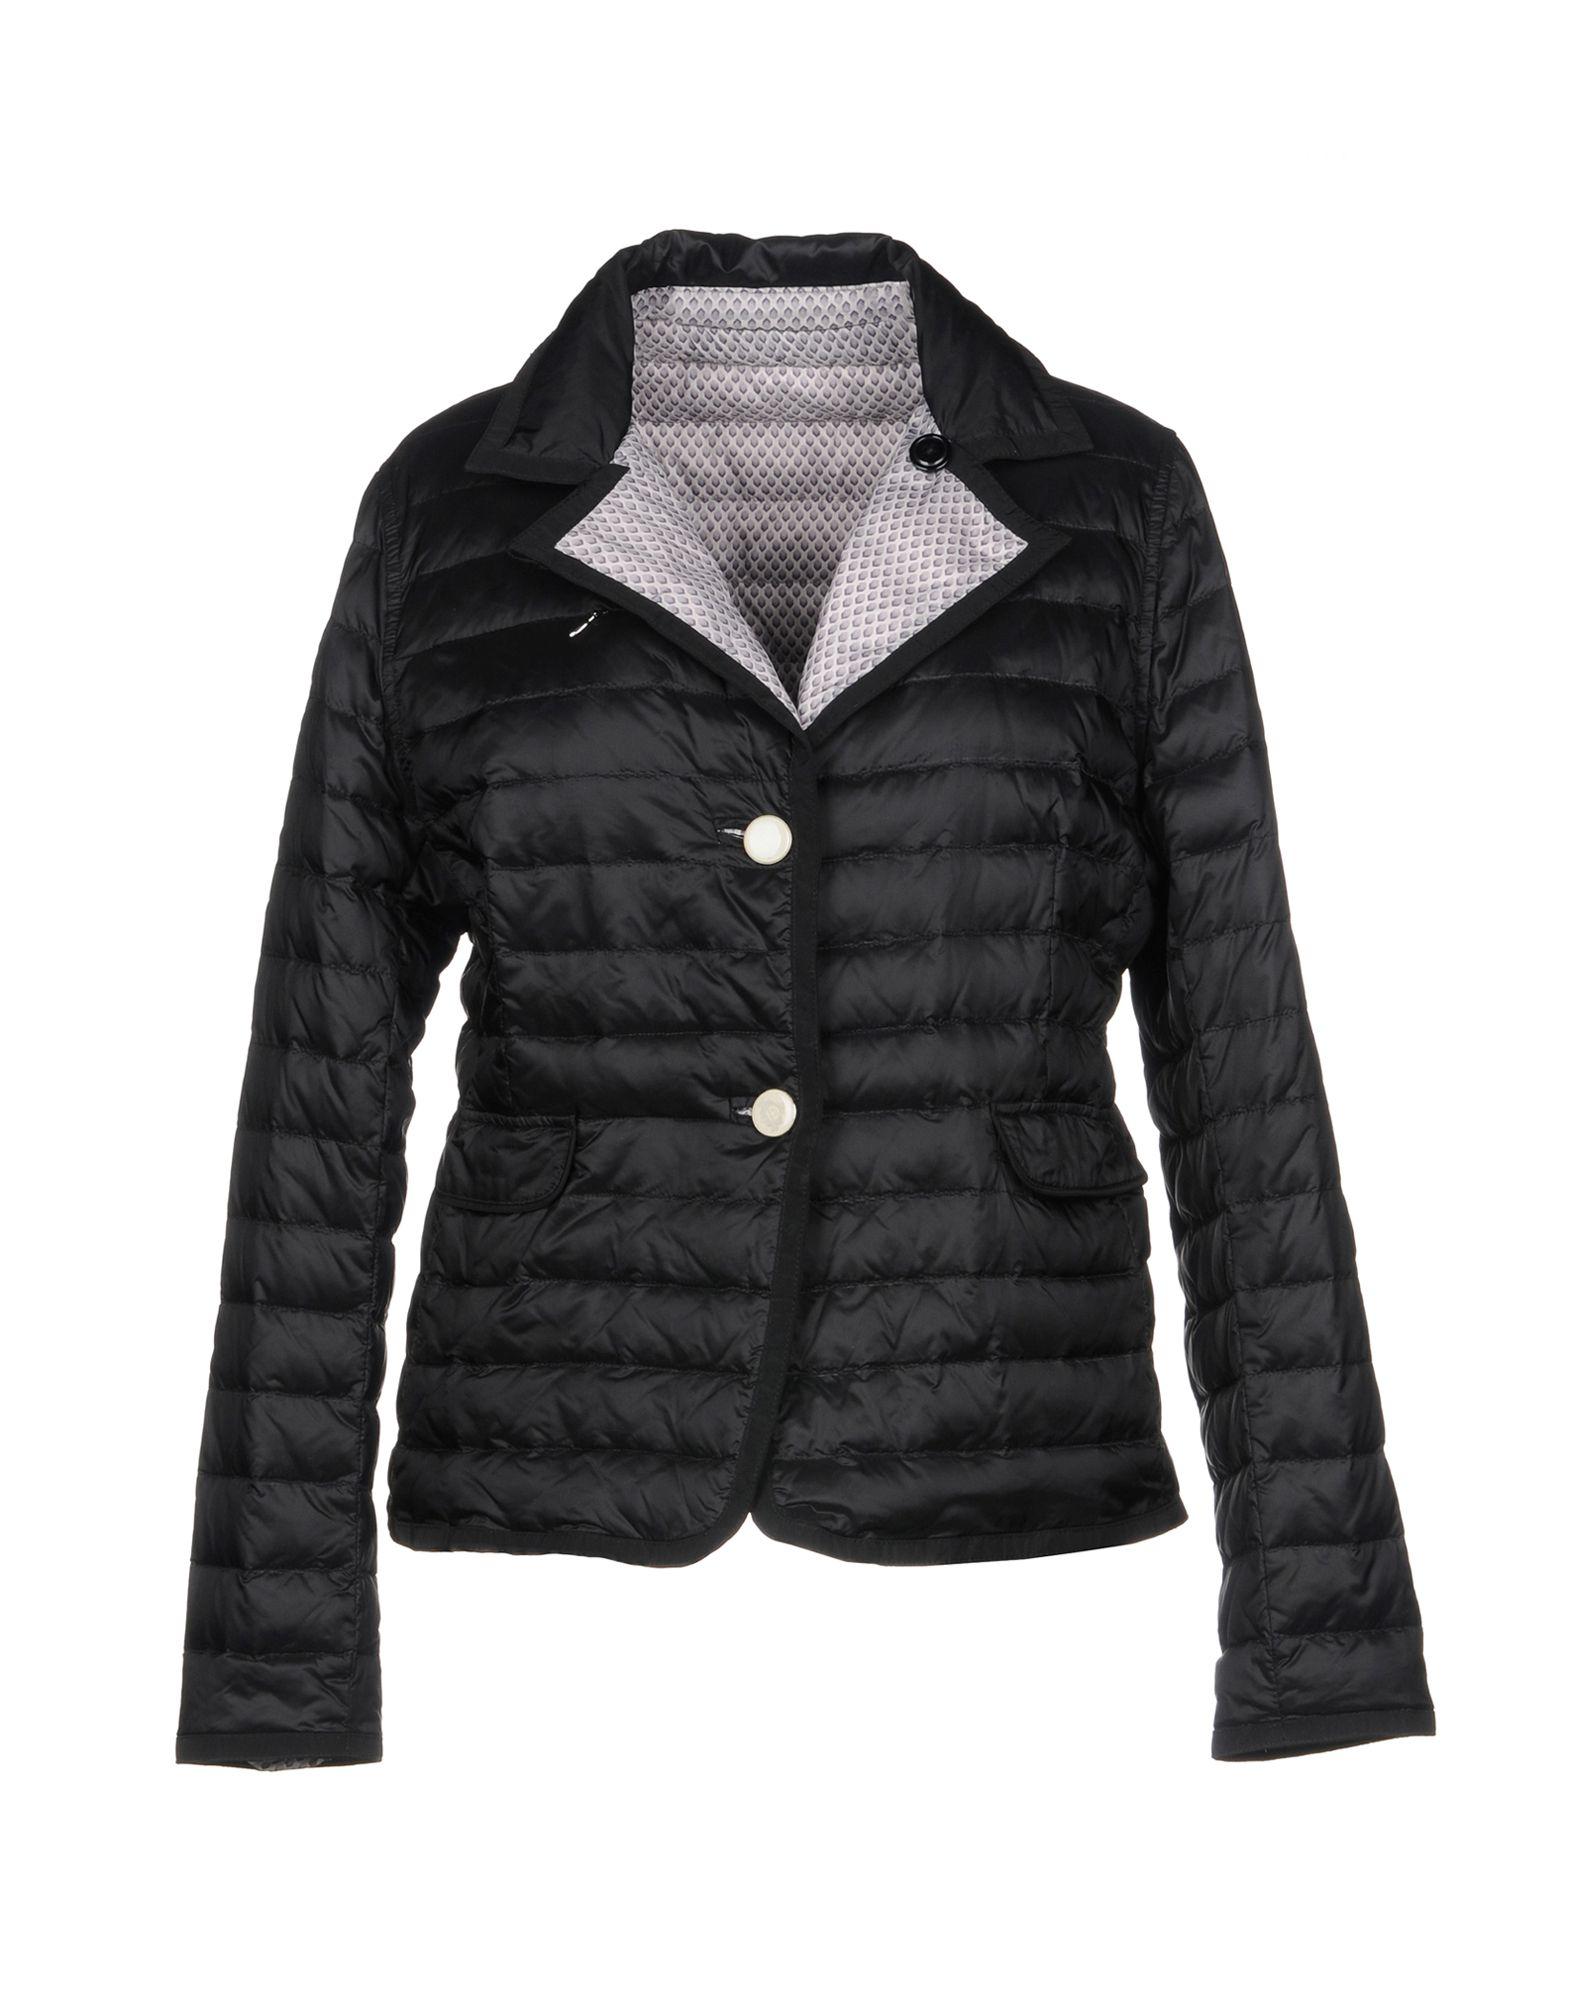 DIEGO M Down Jacket in Black